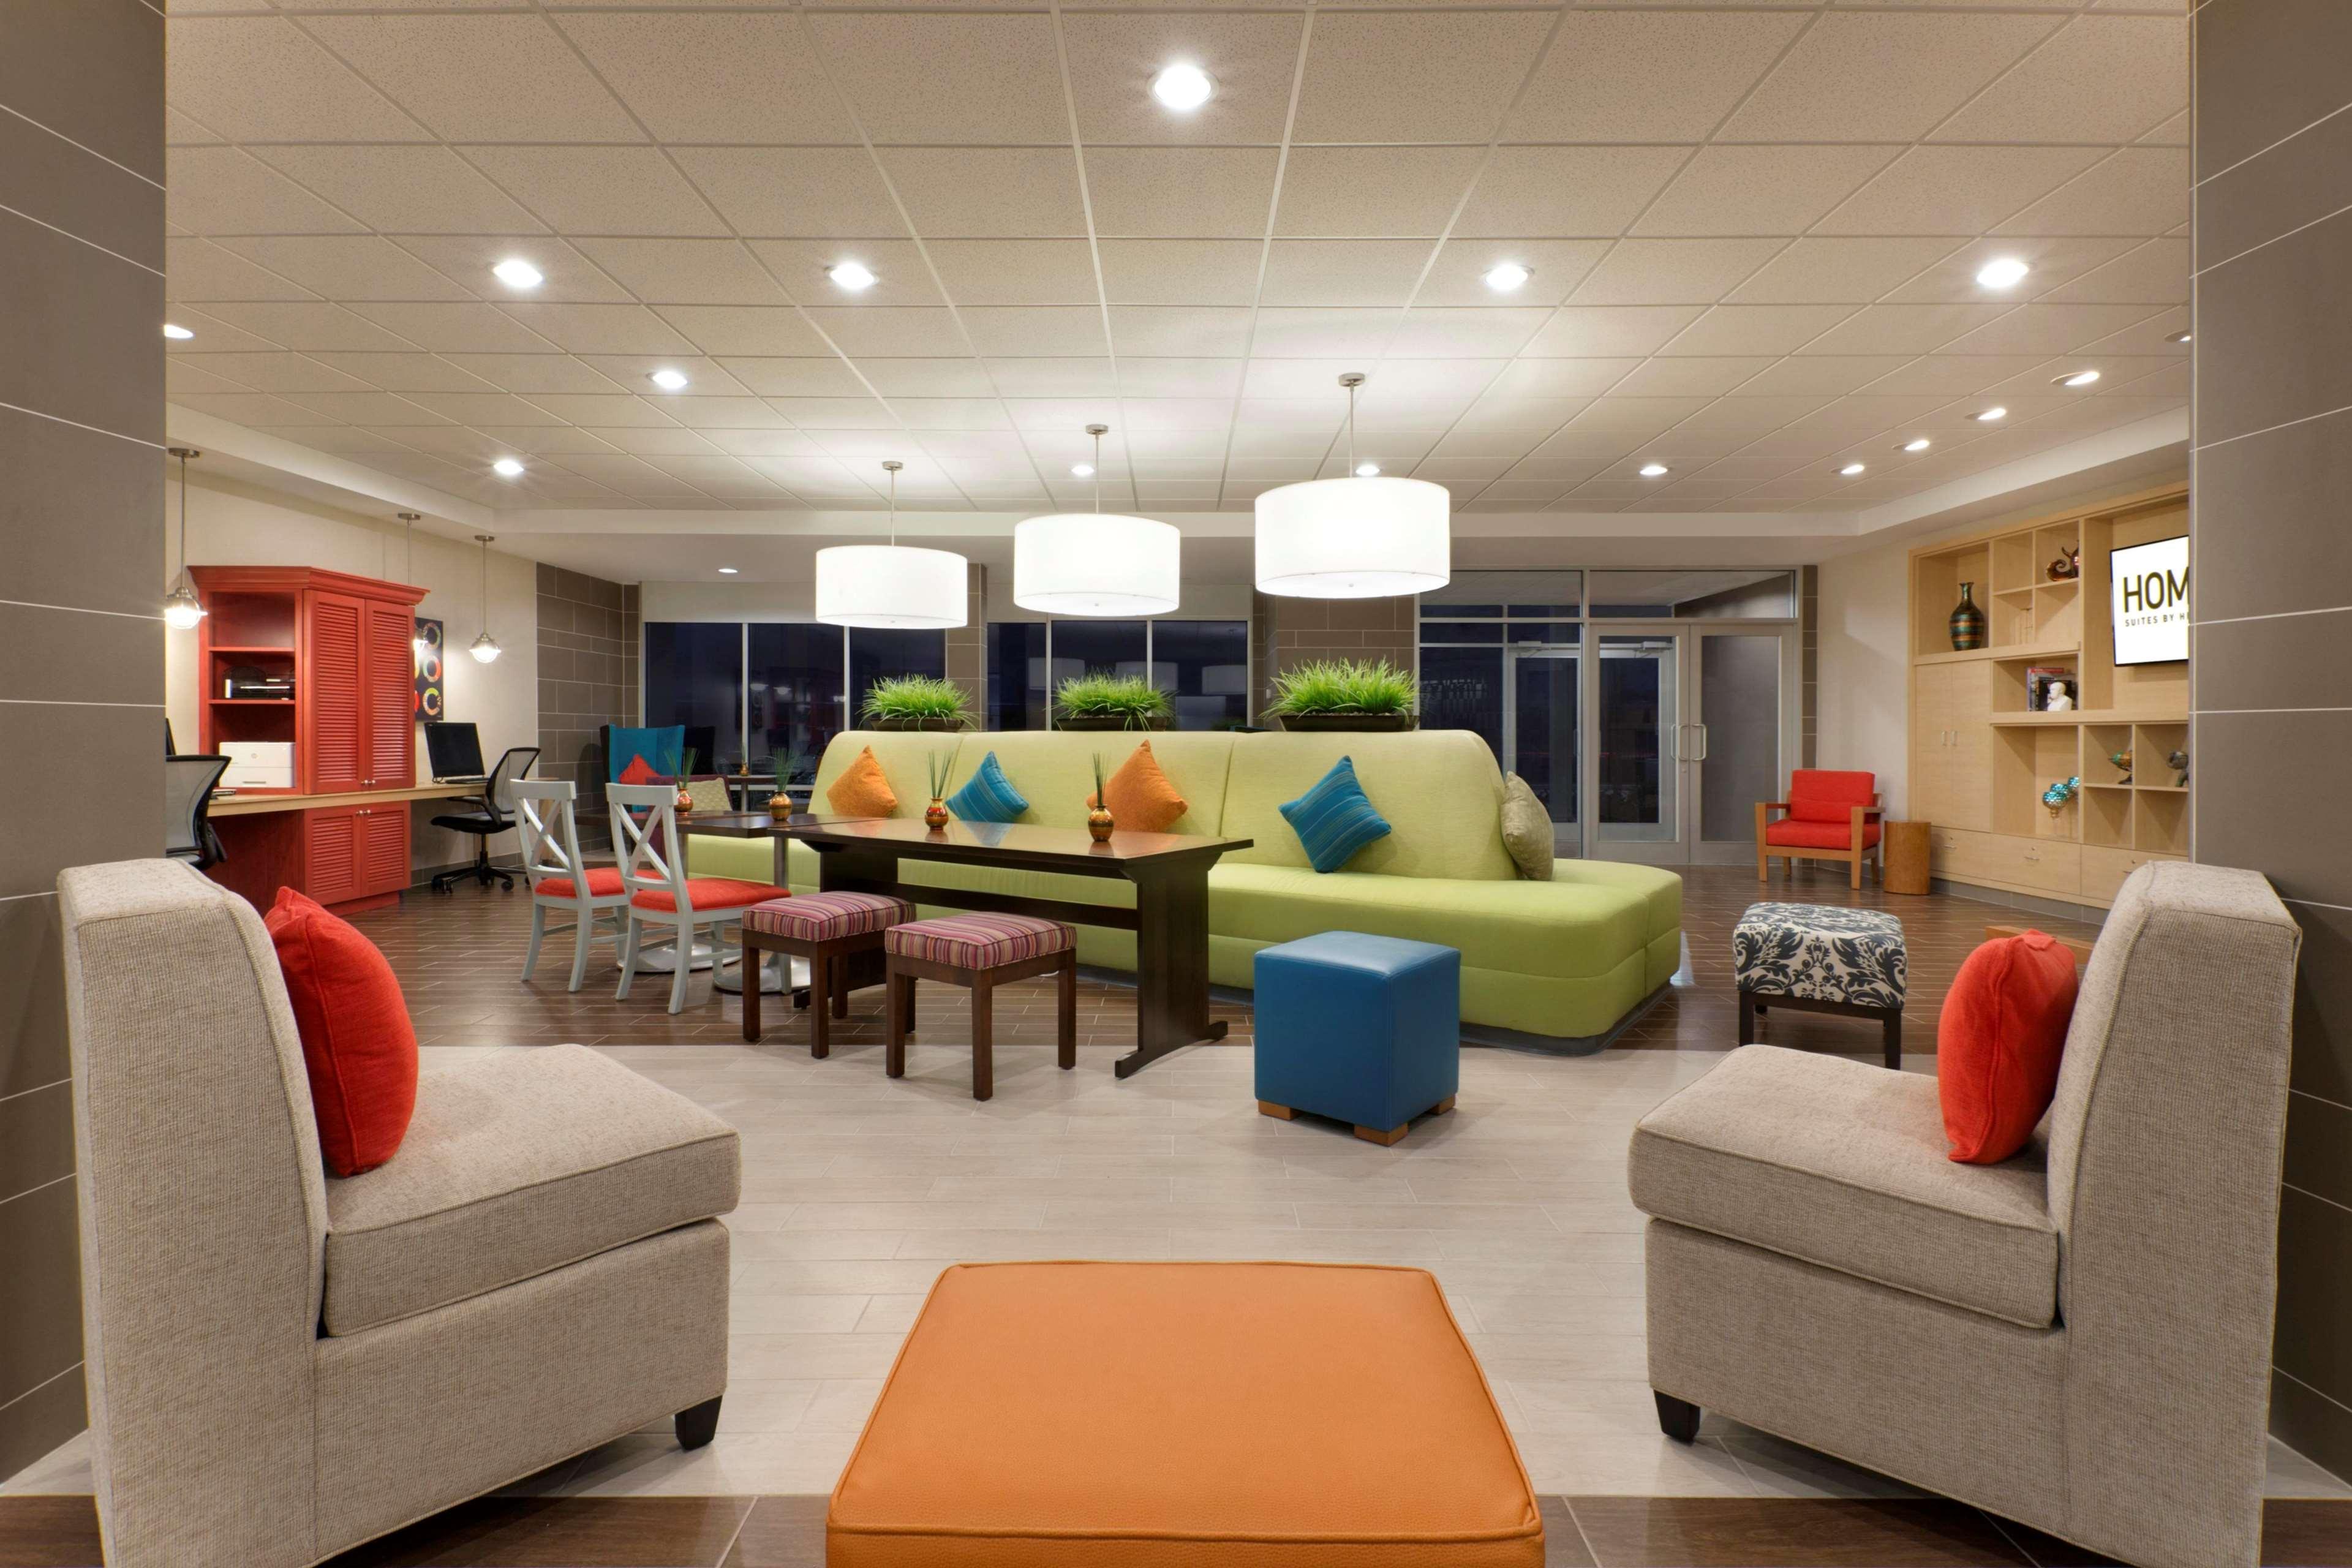 Home2 Suites by Hilton Houston Pasadena image 11